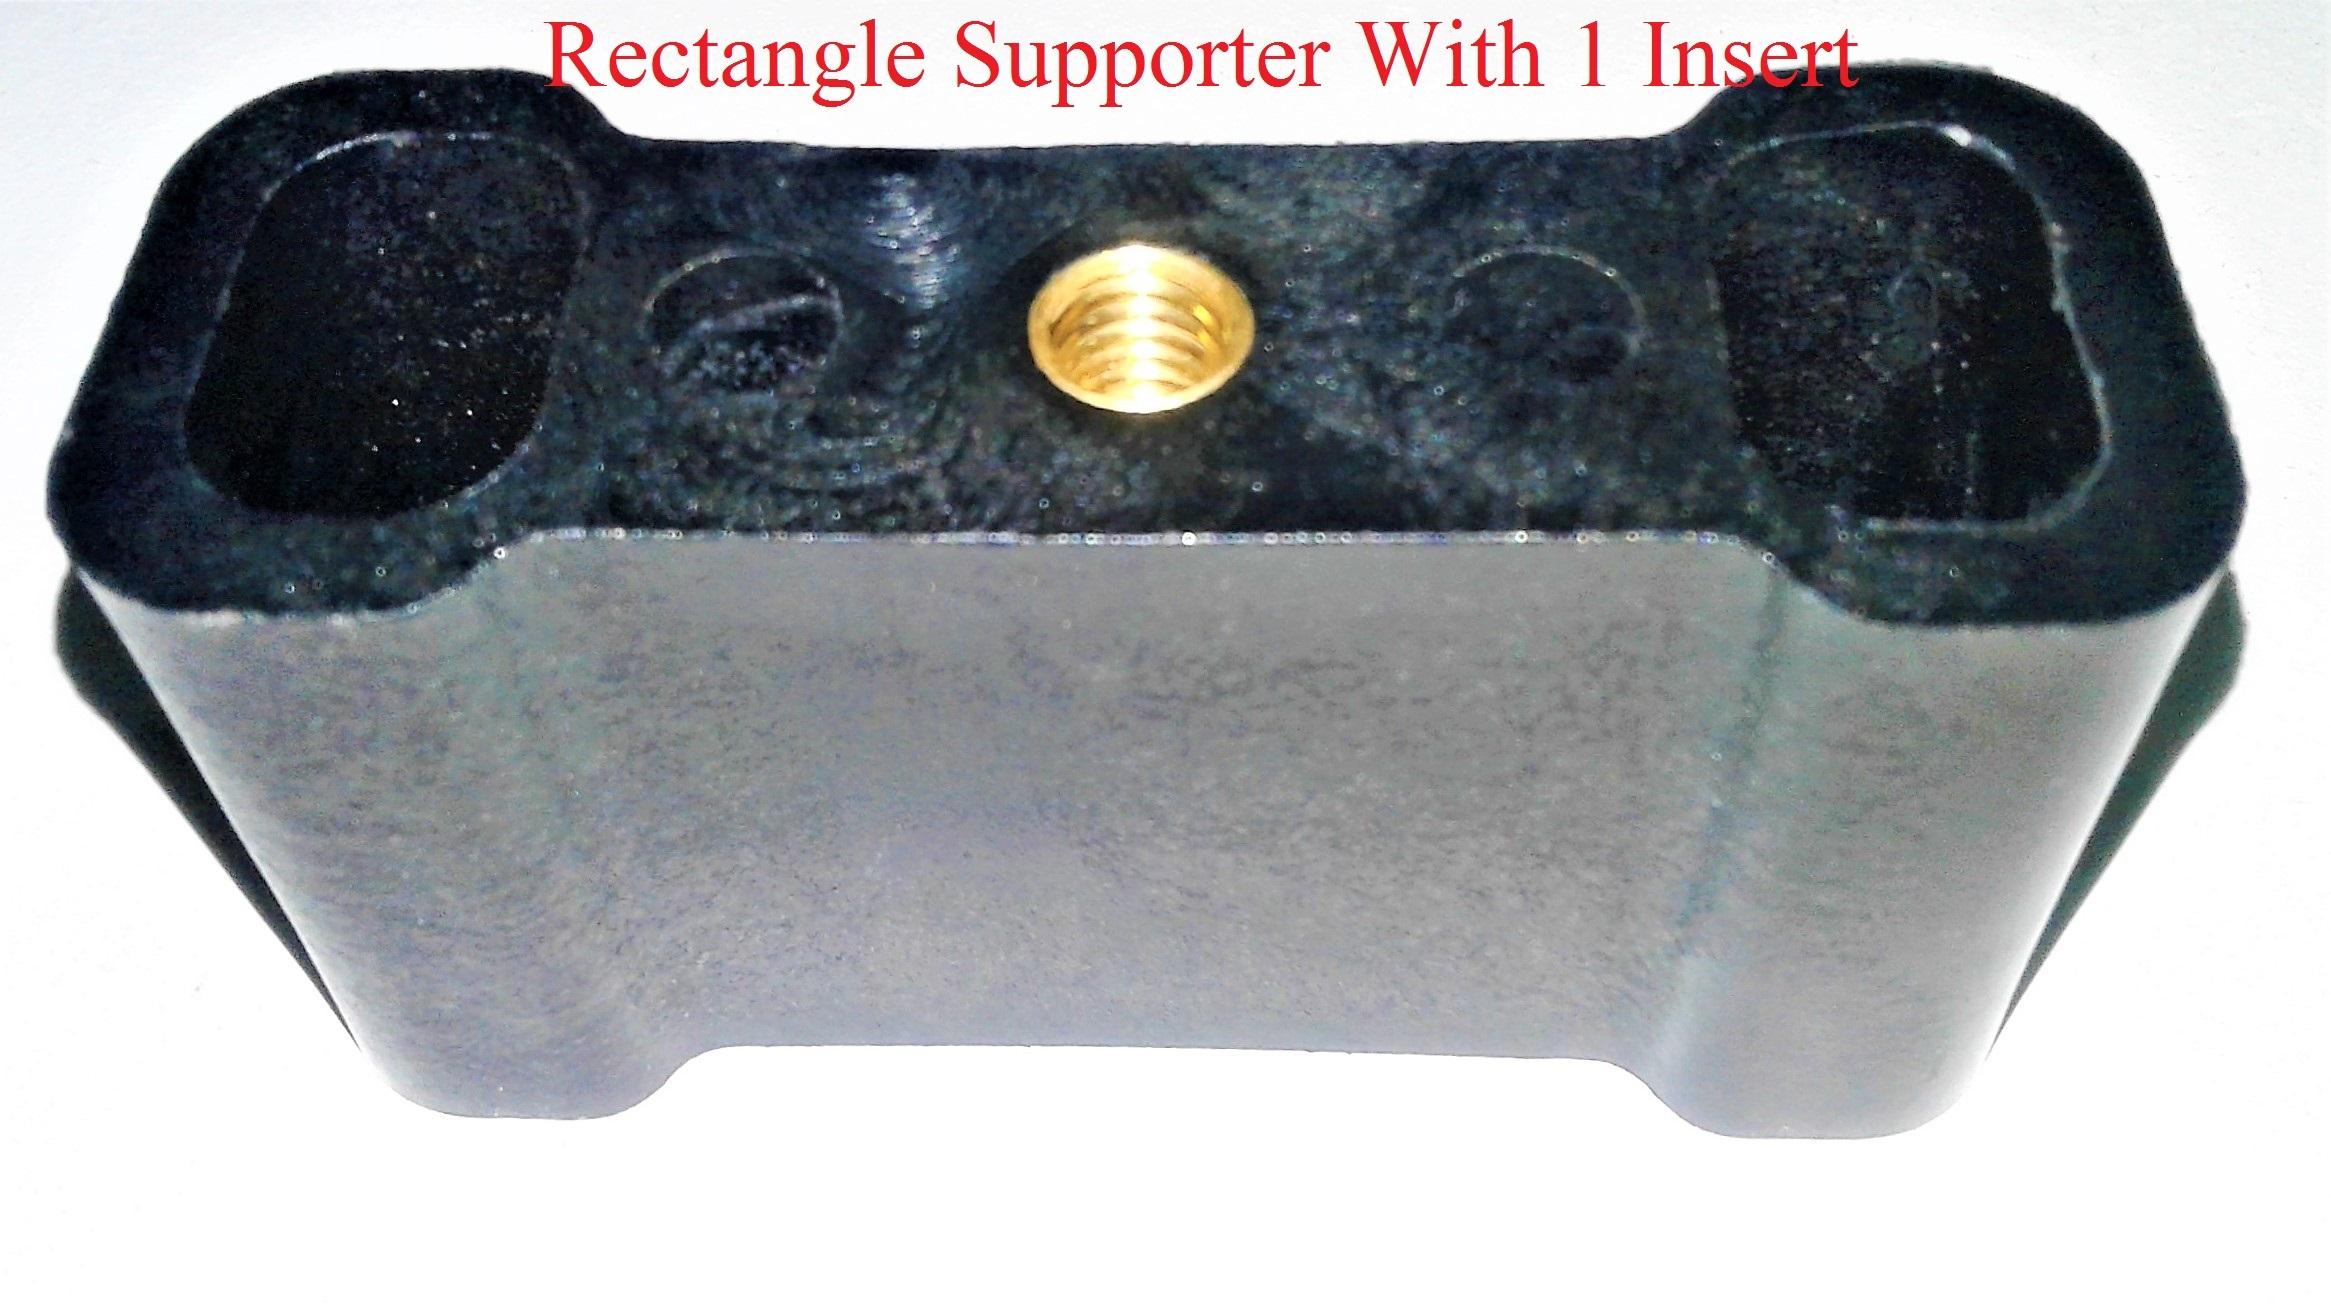 Rectangle Heavy Duty Multipurpose Supporter